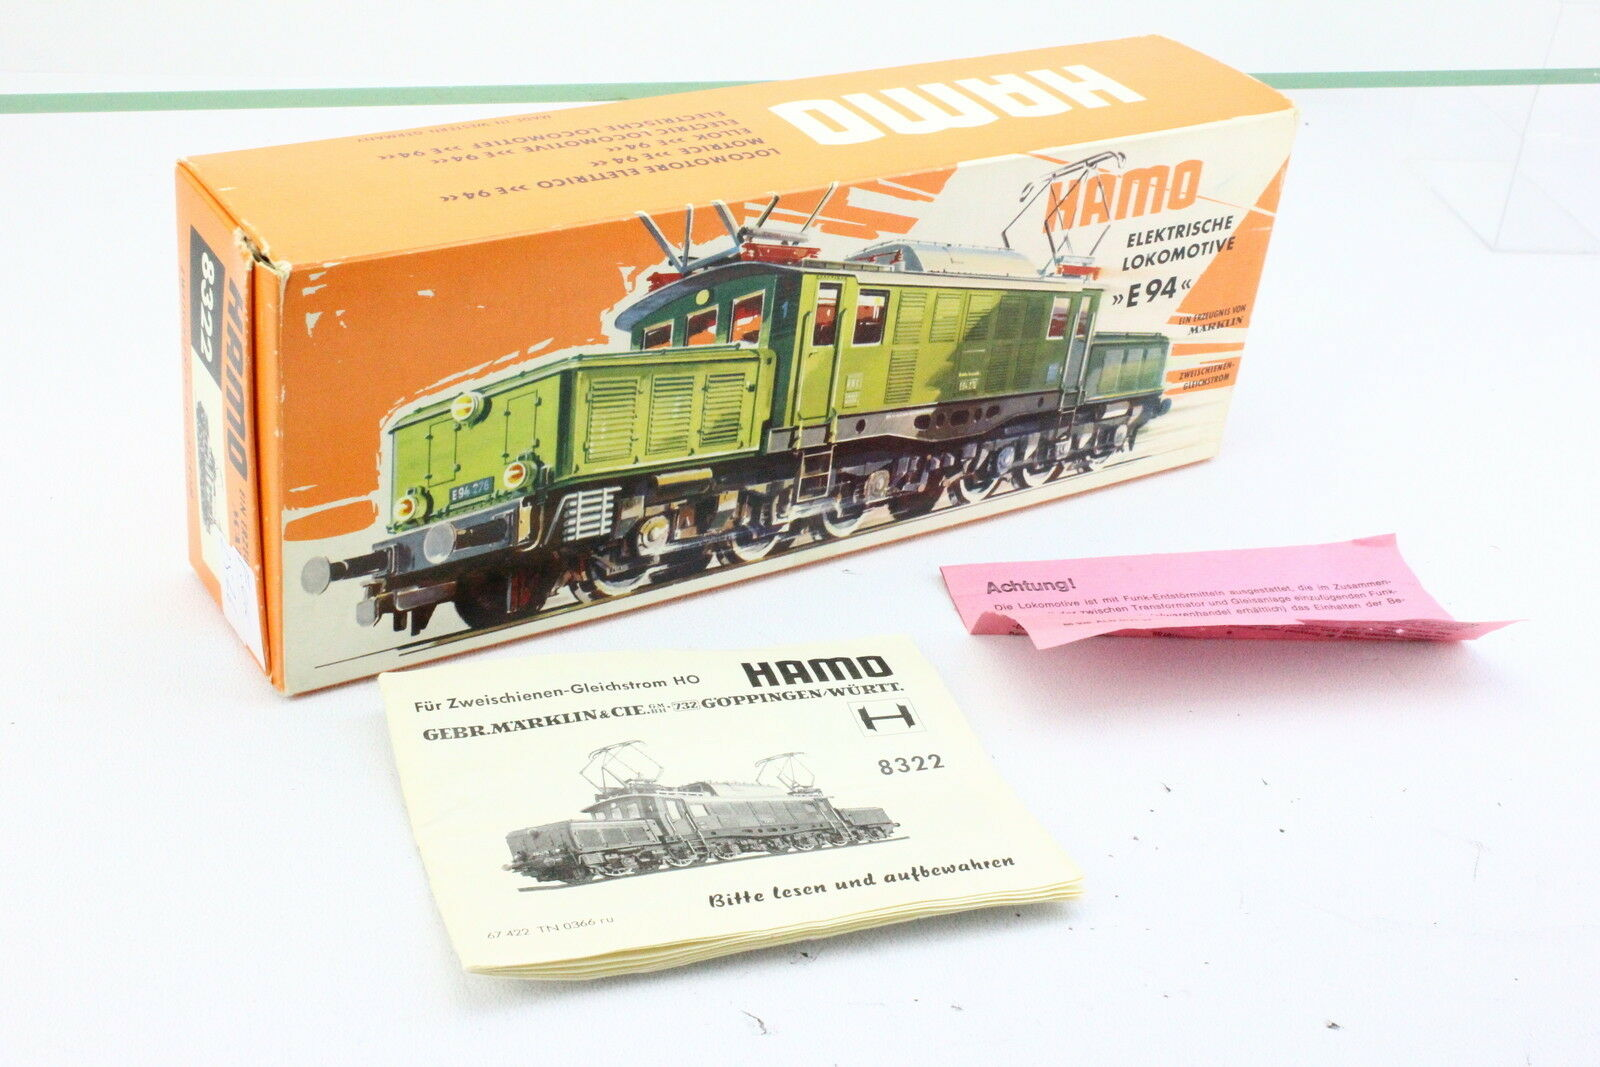 Märklin Hamo 8322 OVP Pictures Cardboard with Guide for BR194 E94 276 DT. Crocodile